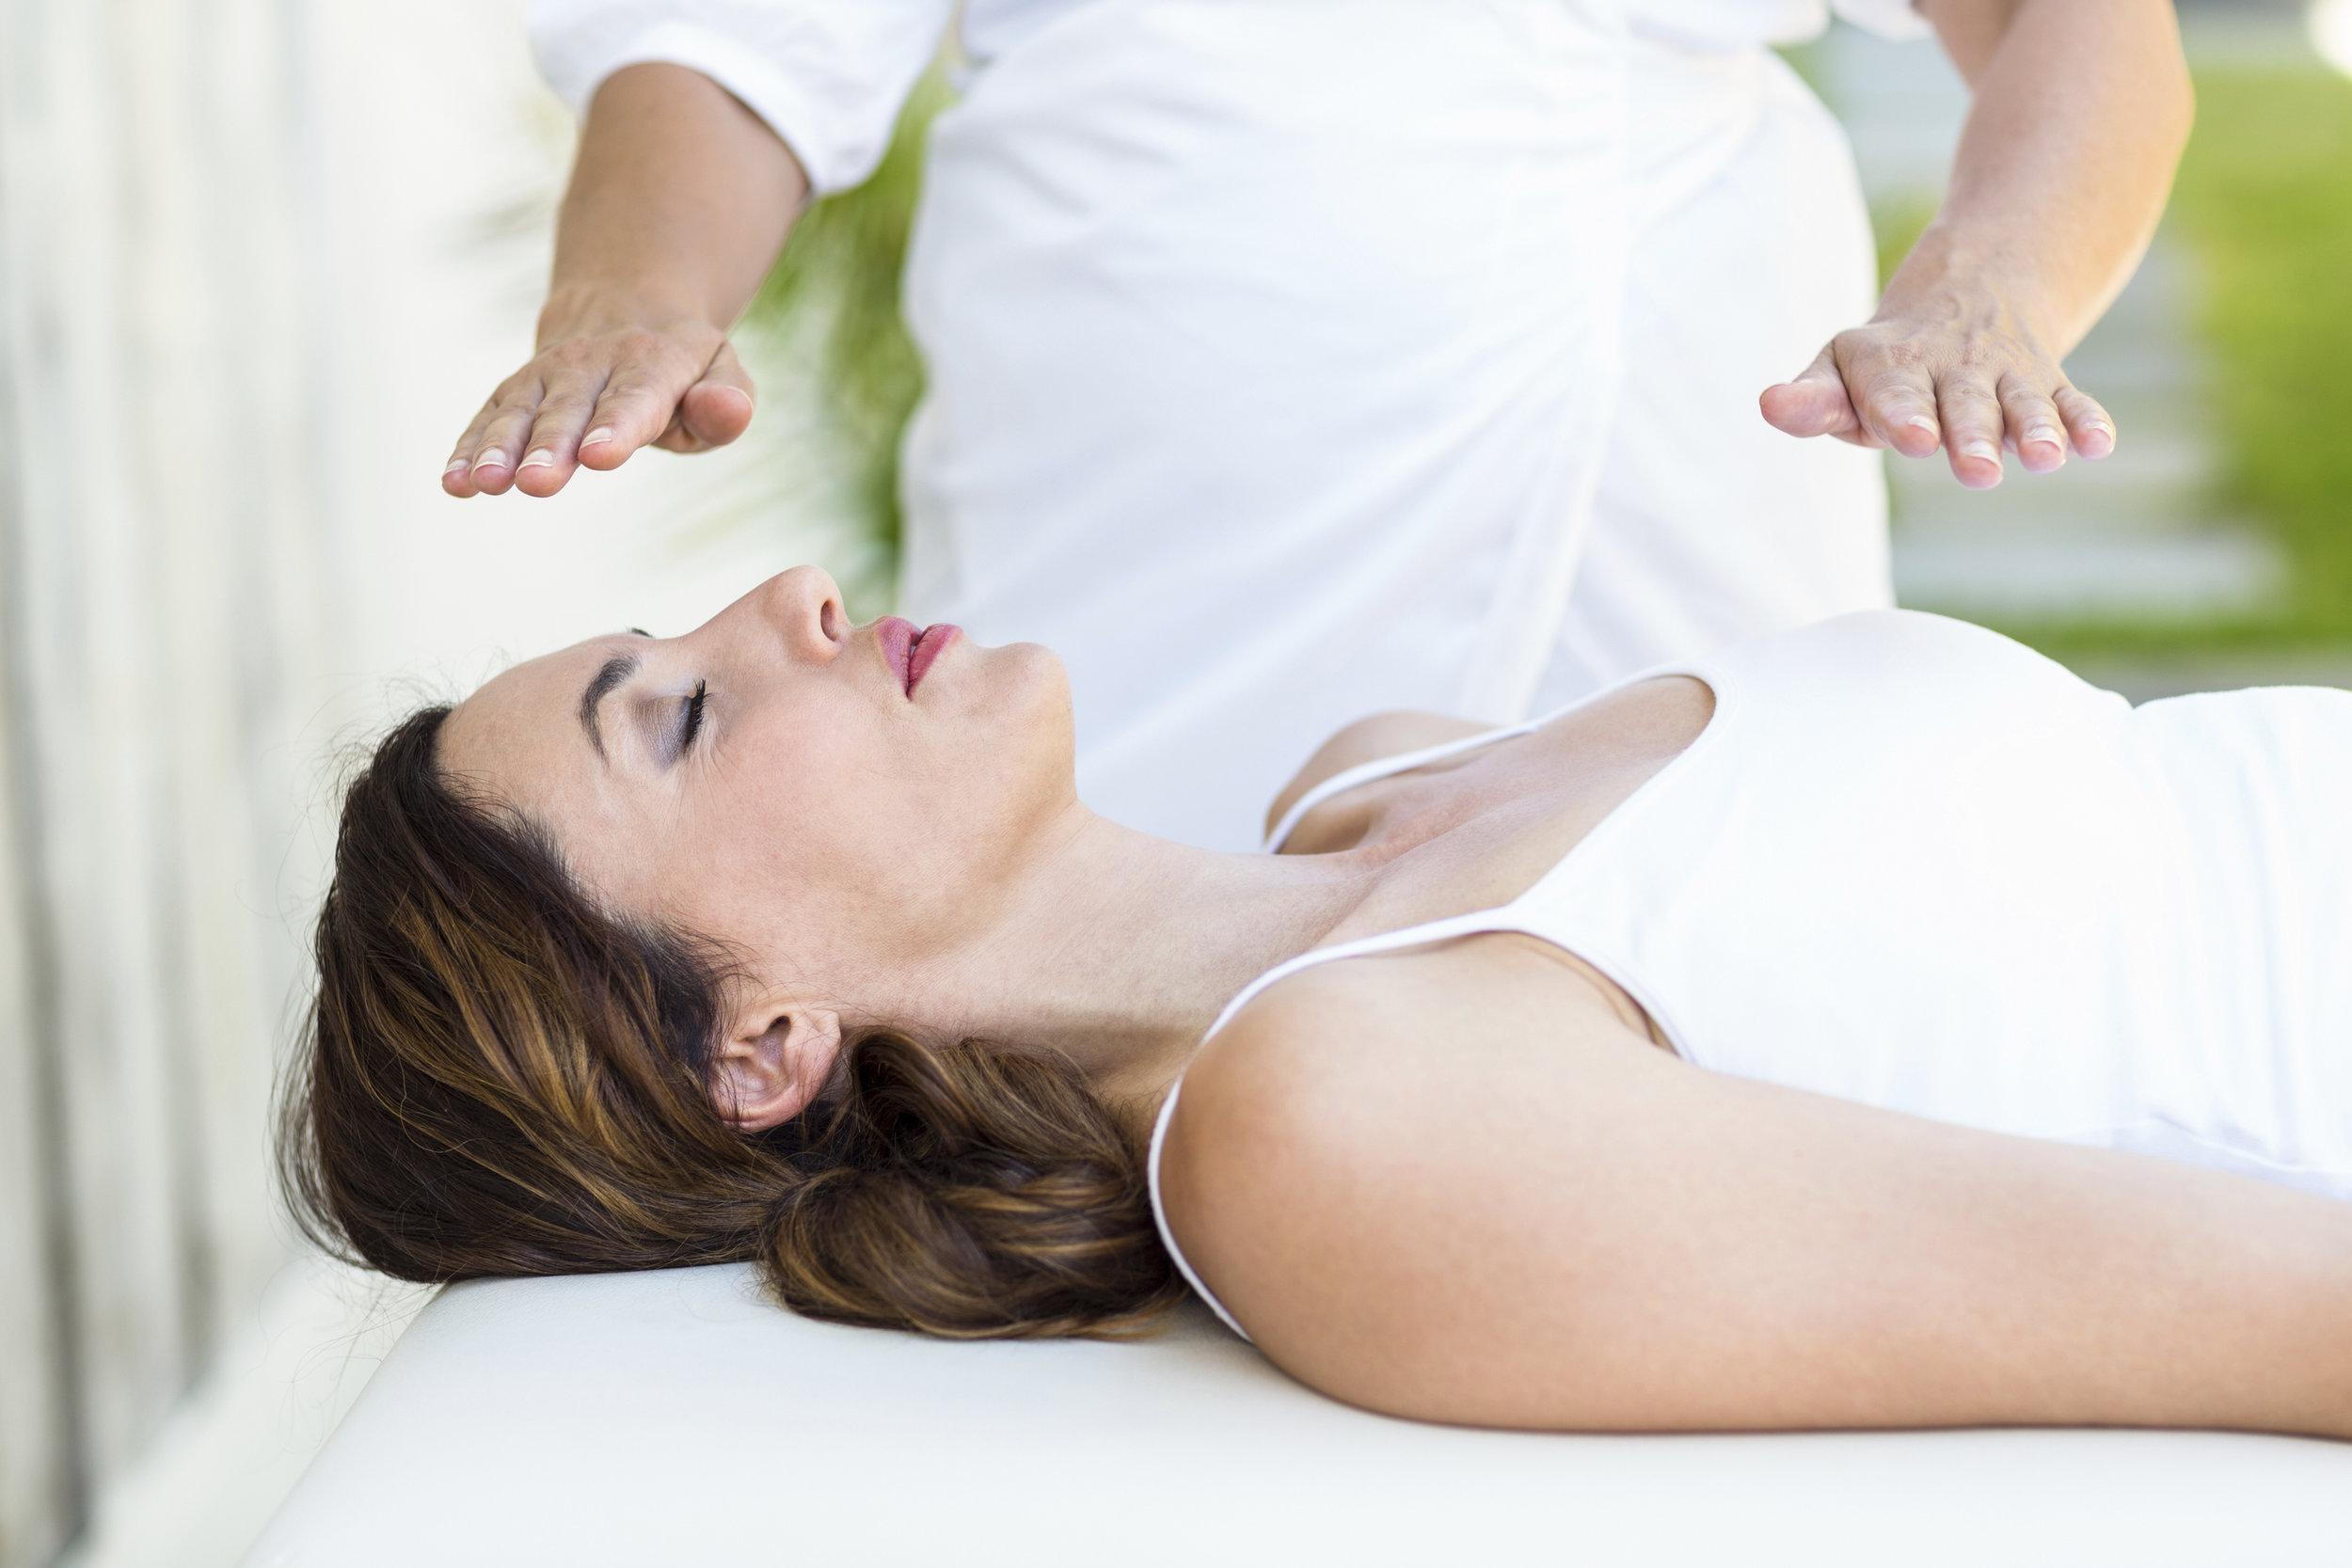 Calm-woman-receiving-reiki-treatment-000072921833_Large.jpg